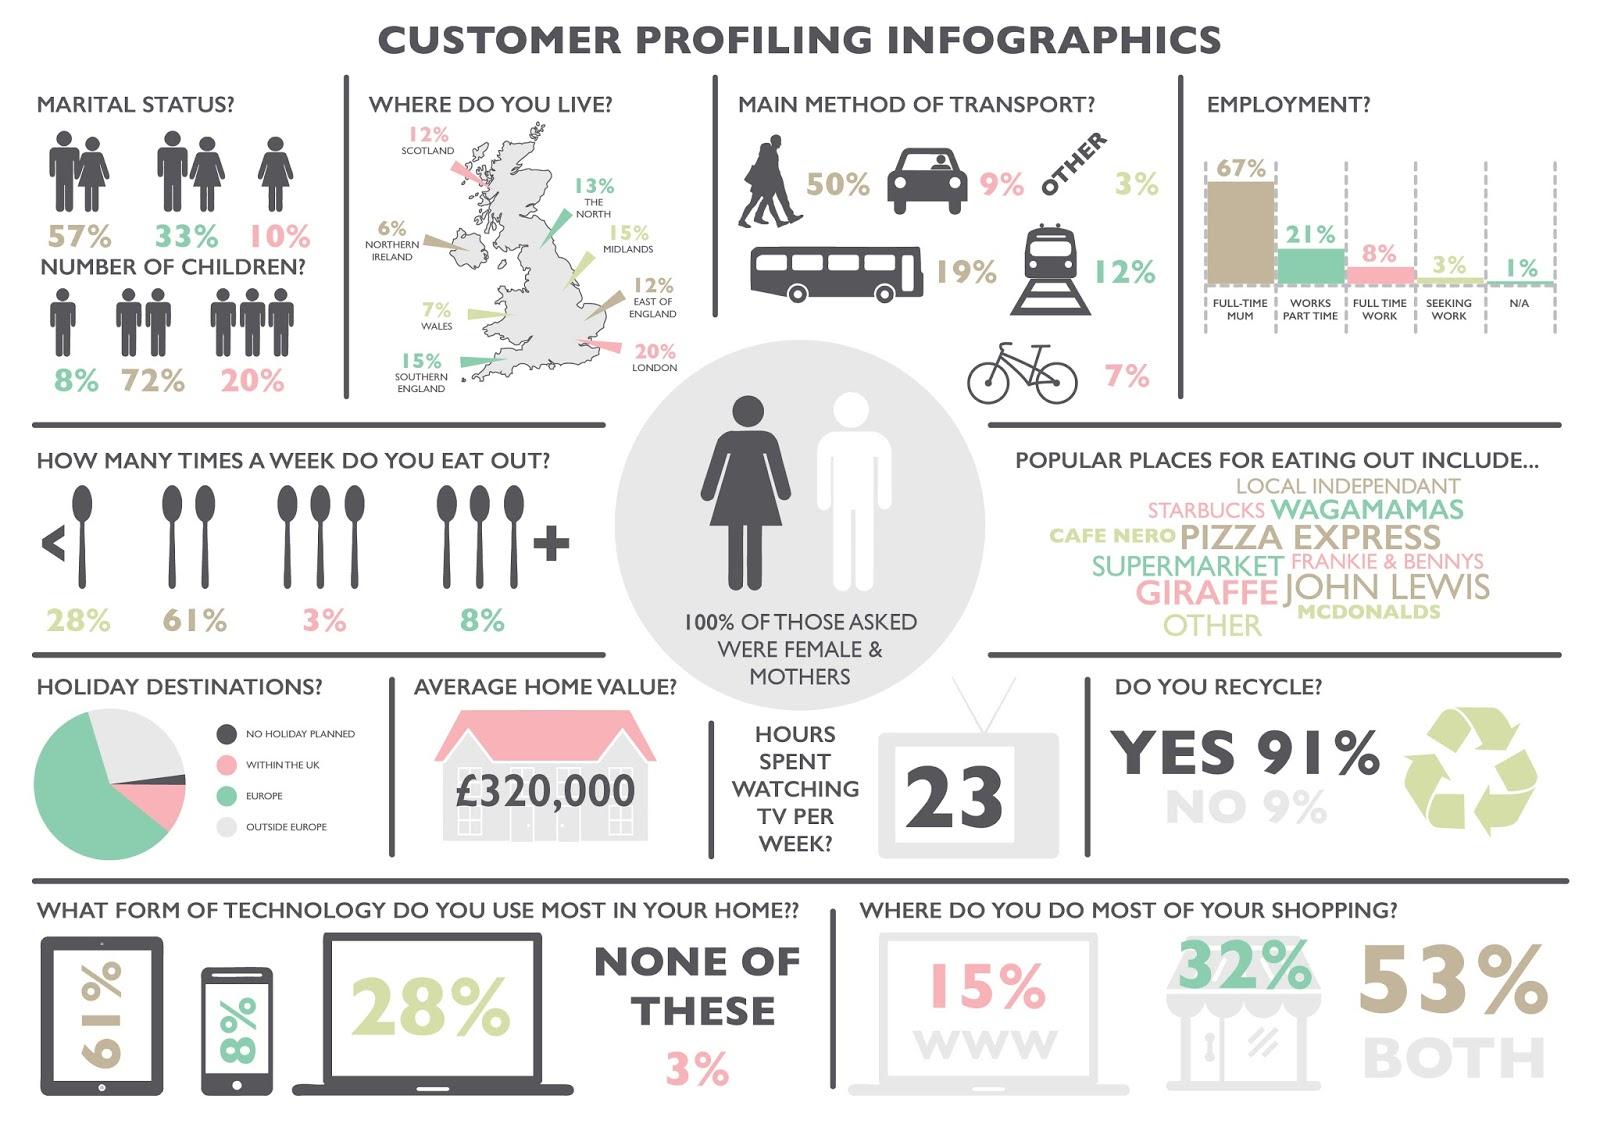 Emily Kiddy: Customer Profiling Infographic